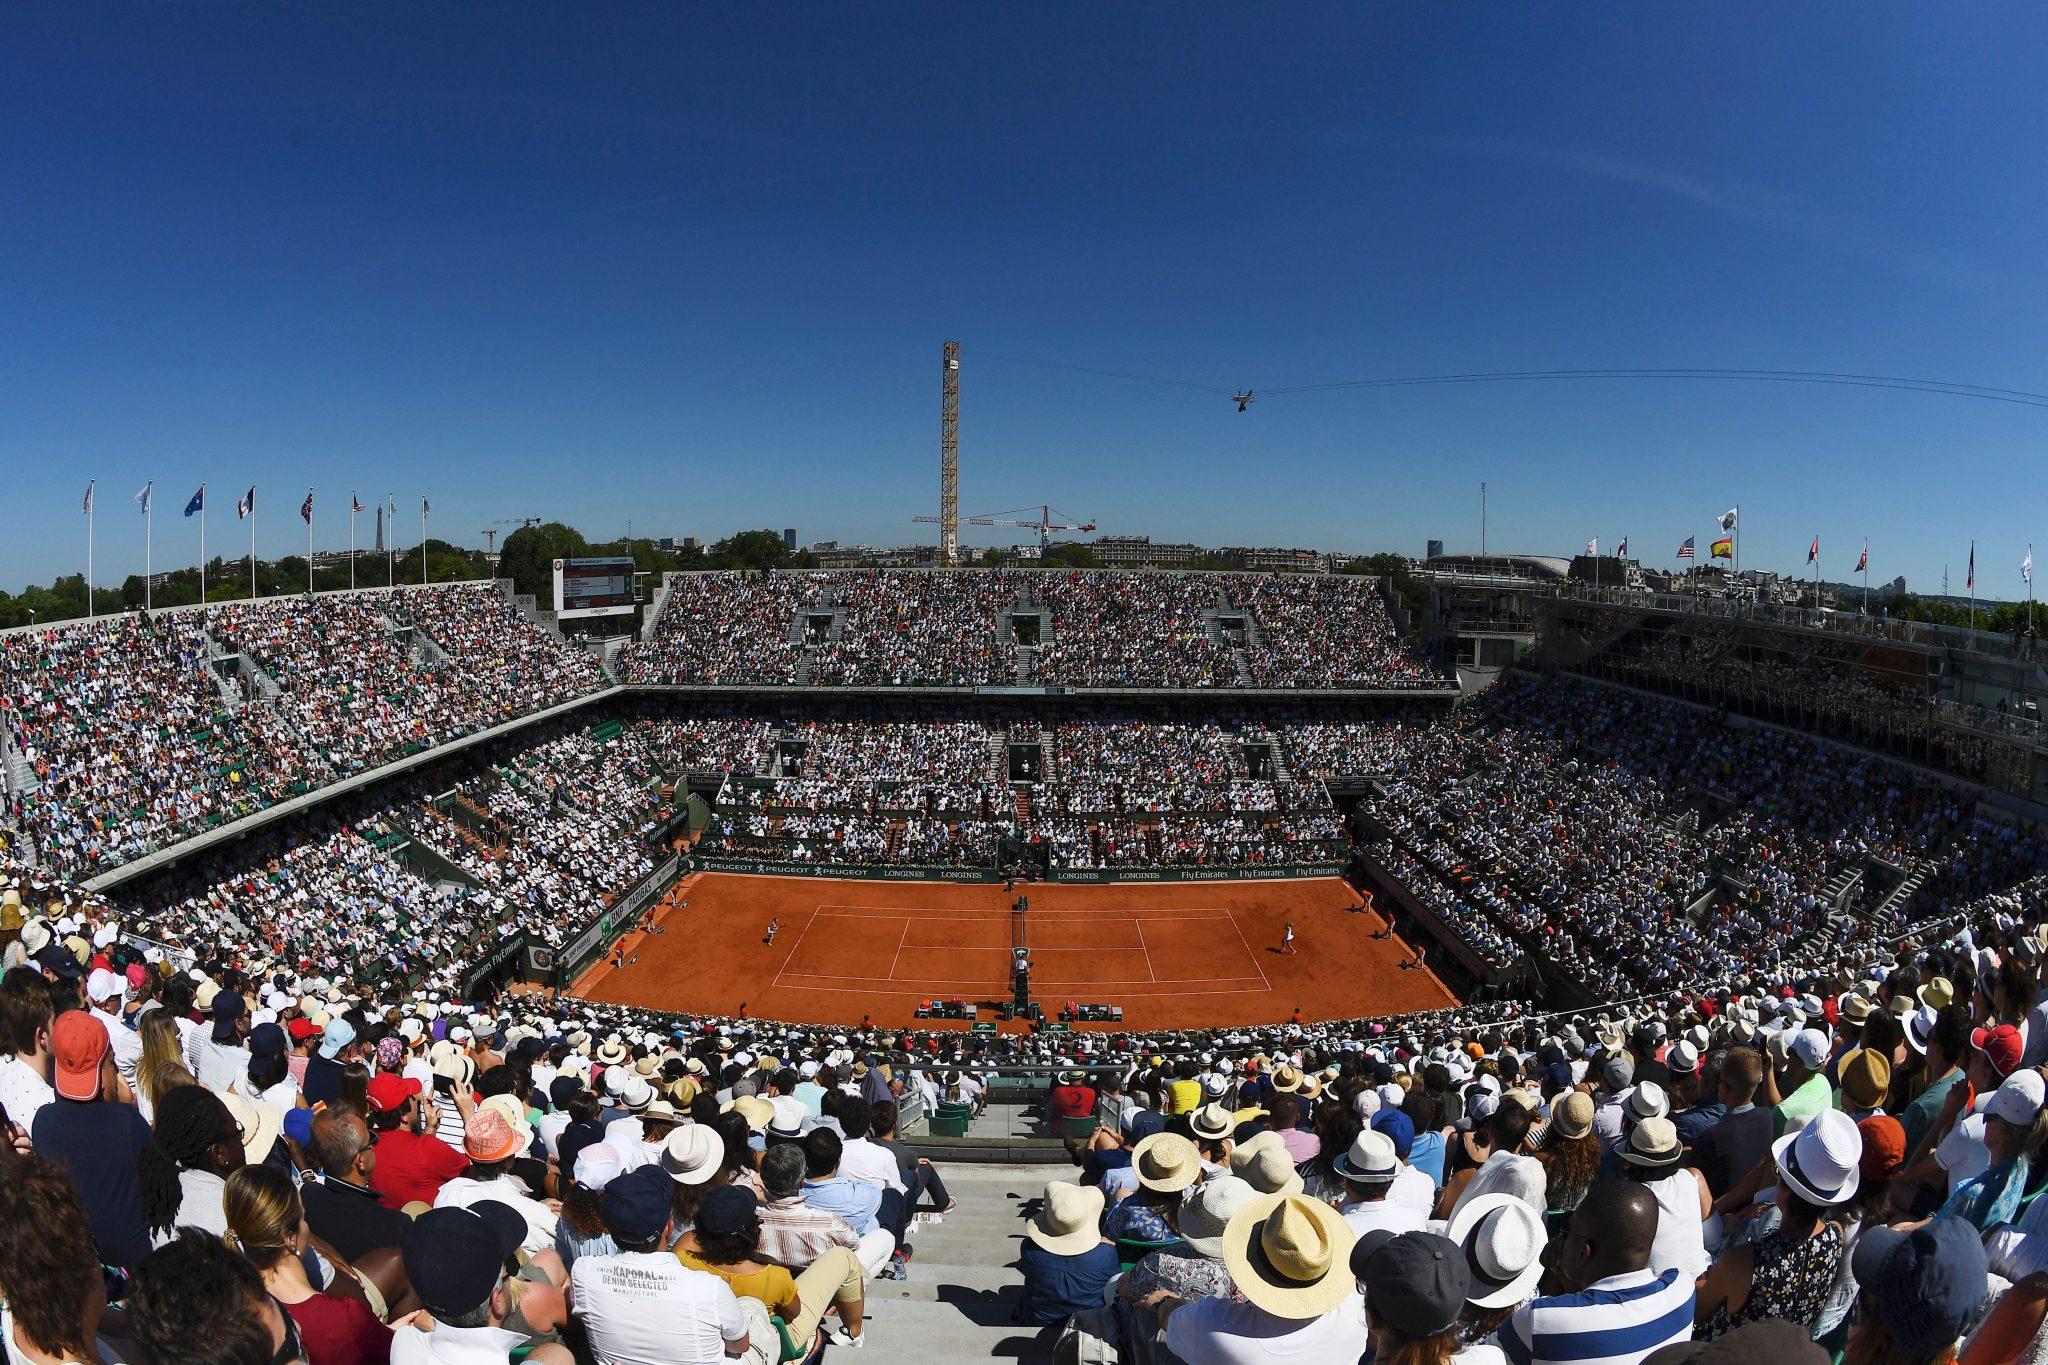 Eurosport launching 4K UHD TV channel for Roland Garros – Digital TV